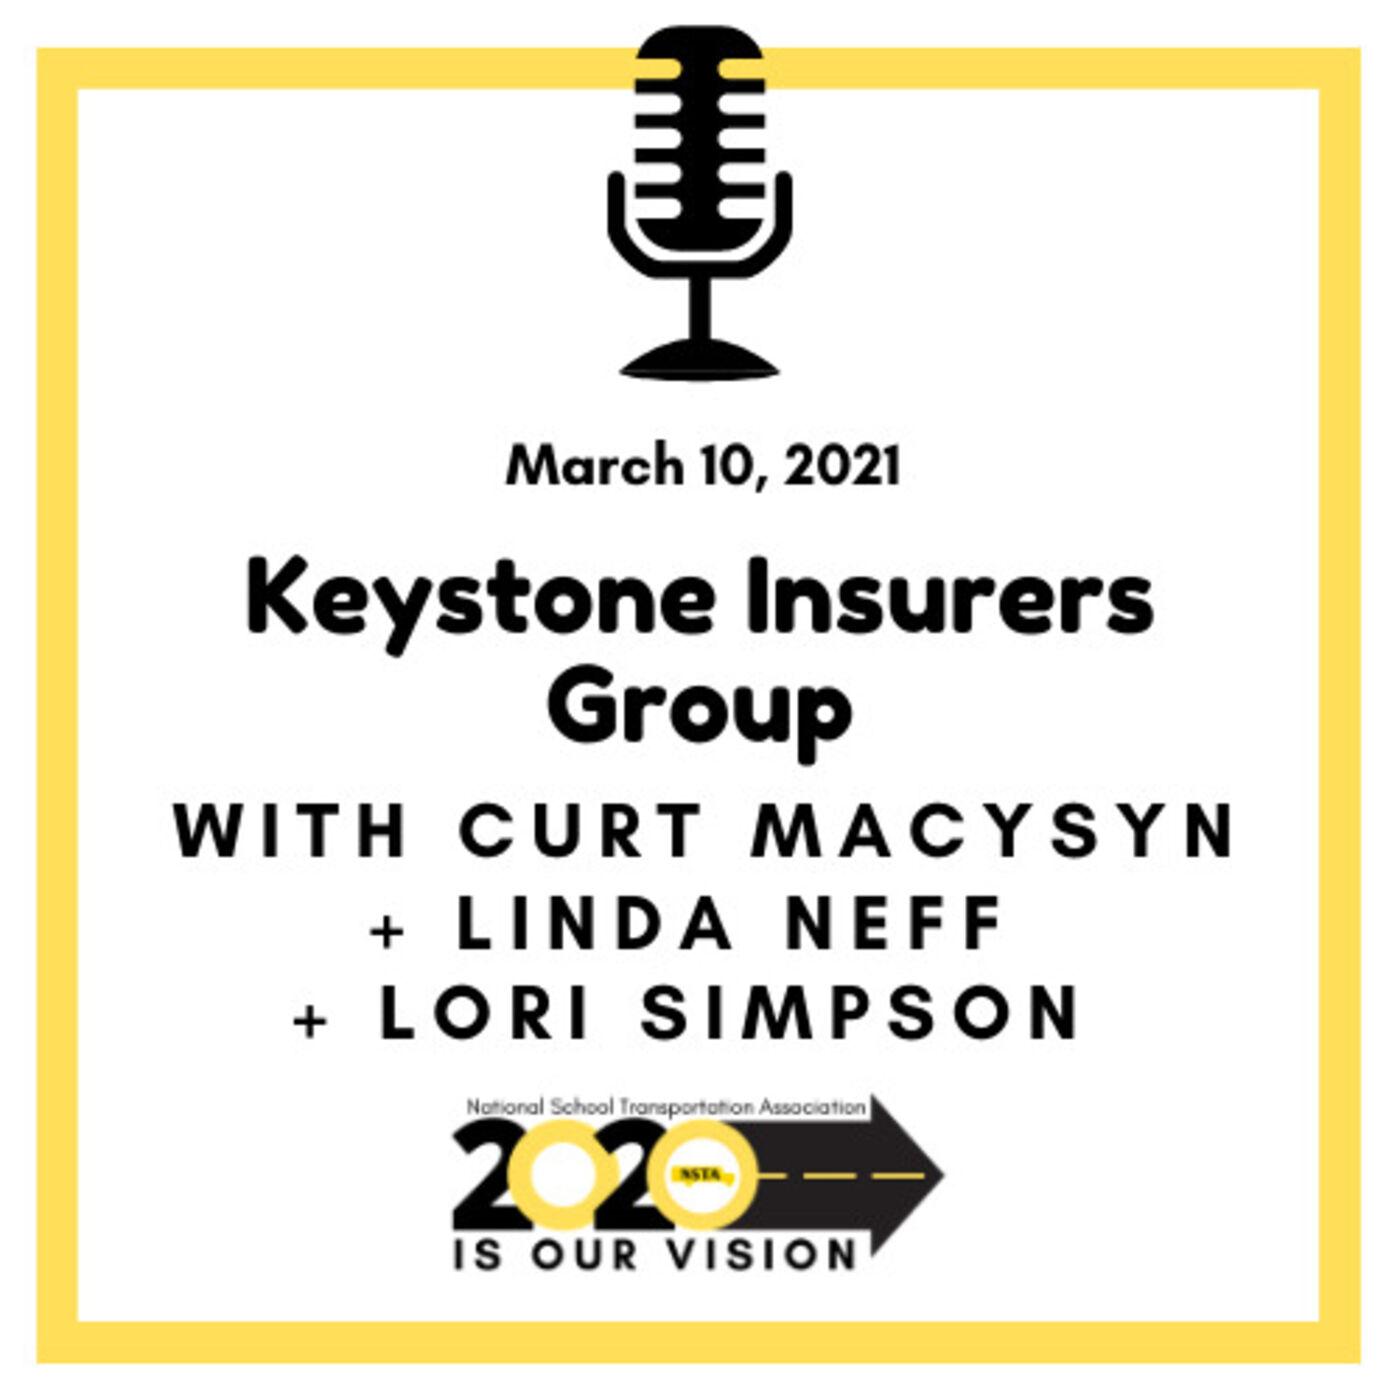 Keystone Insurers Group-Linda Neff and Lori Simpson